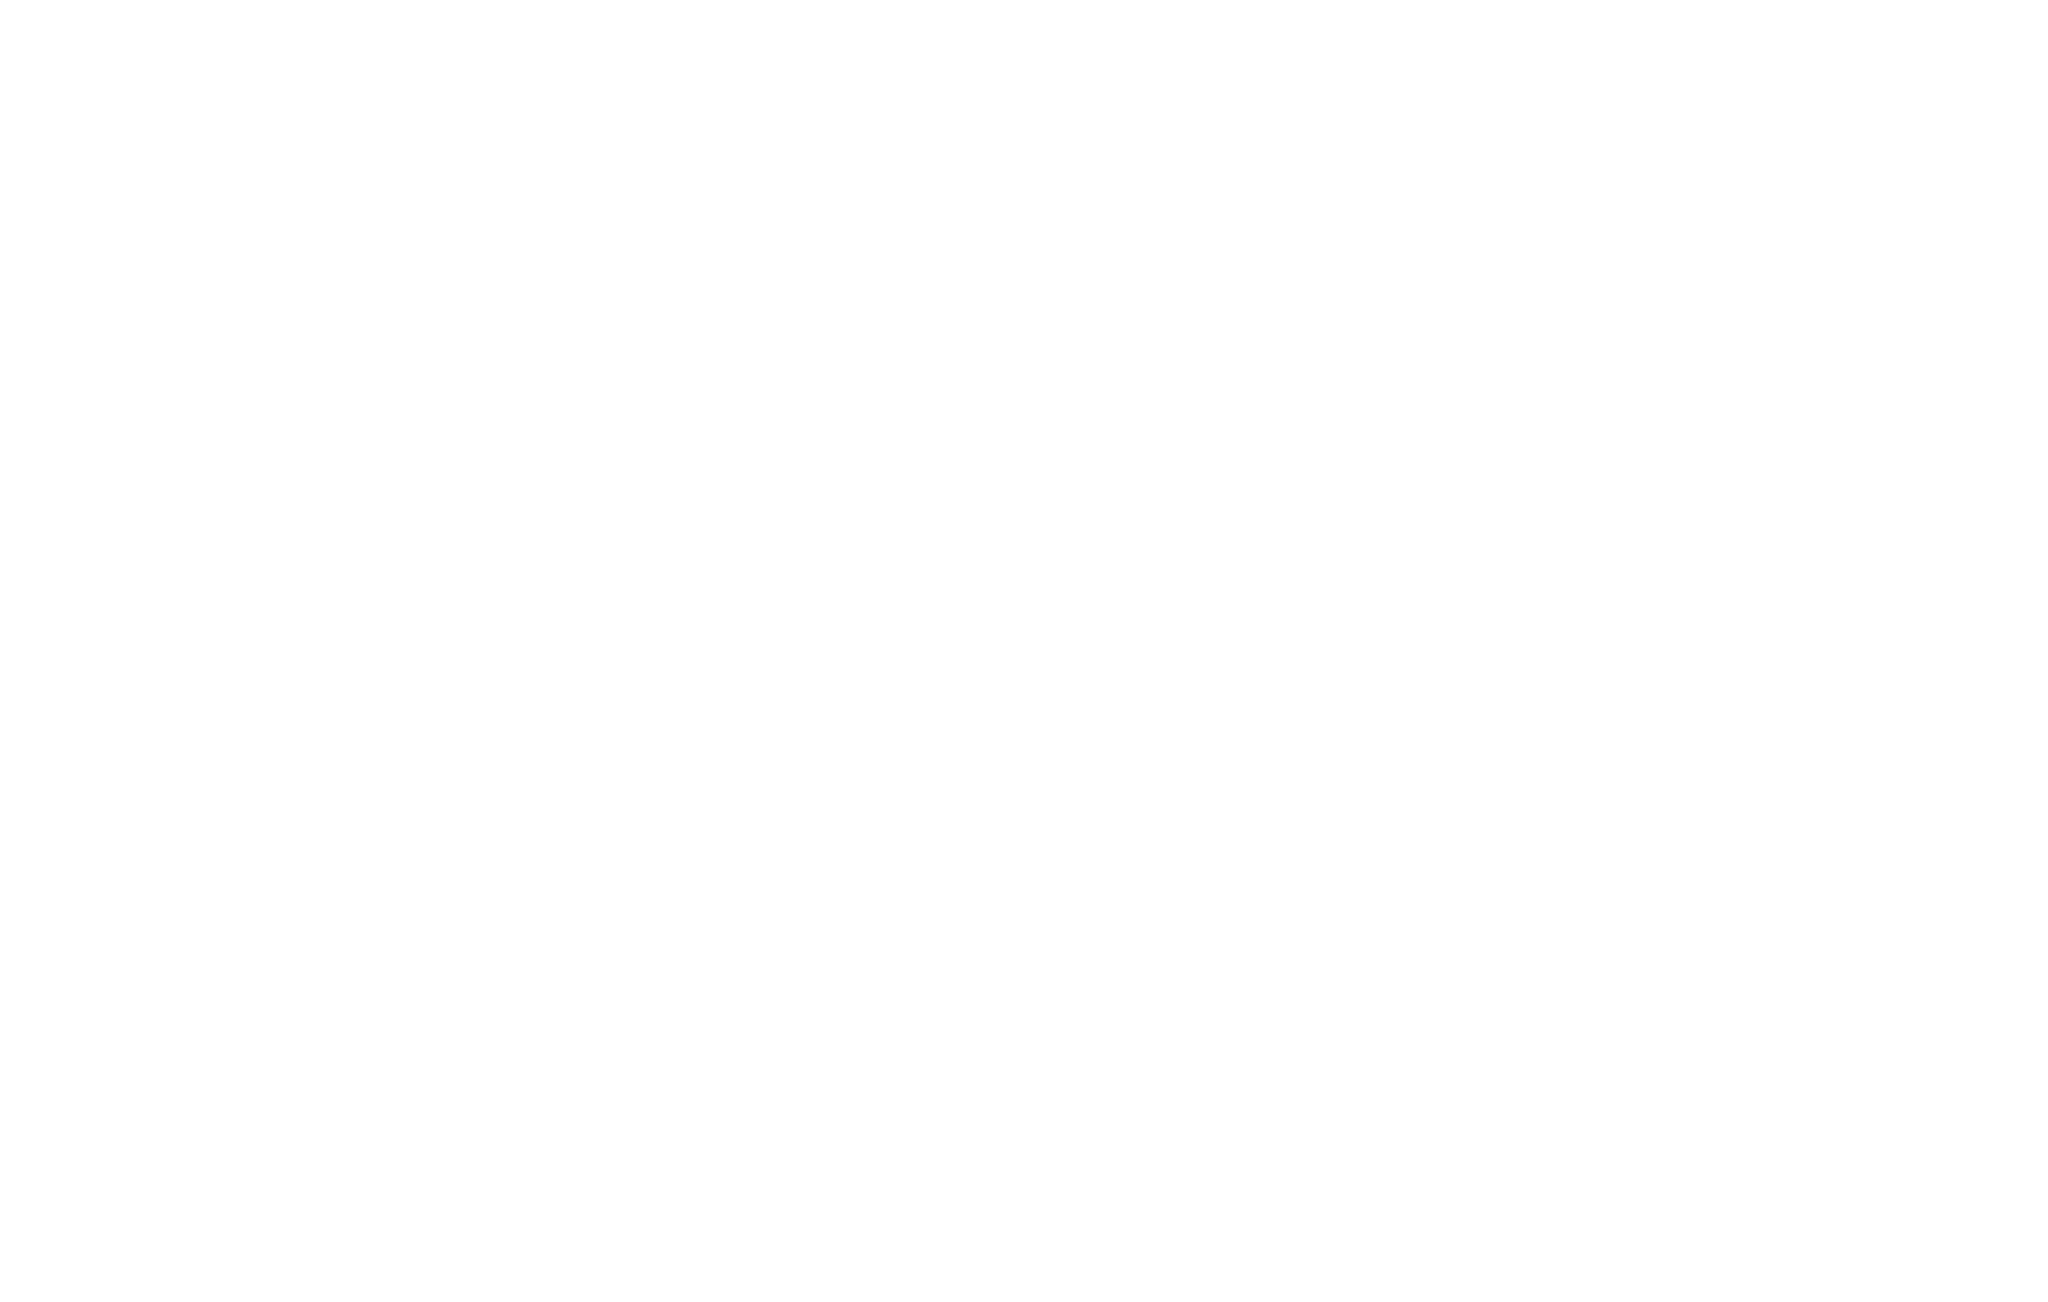 madelinebienetre